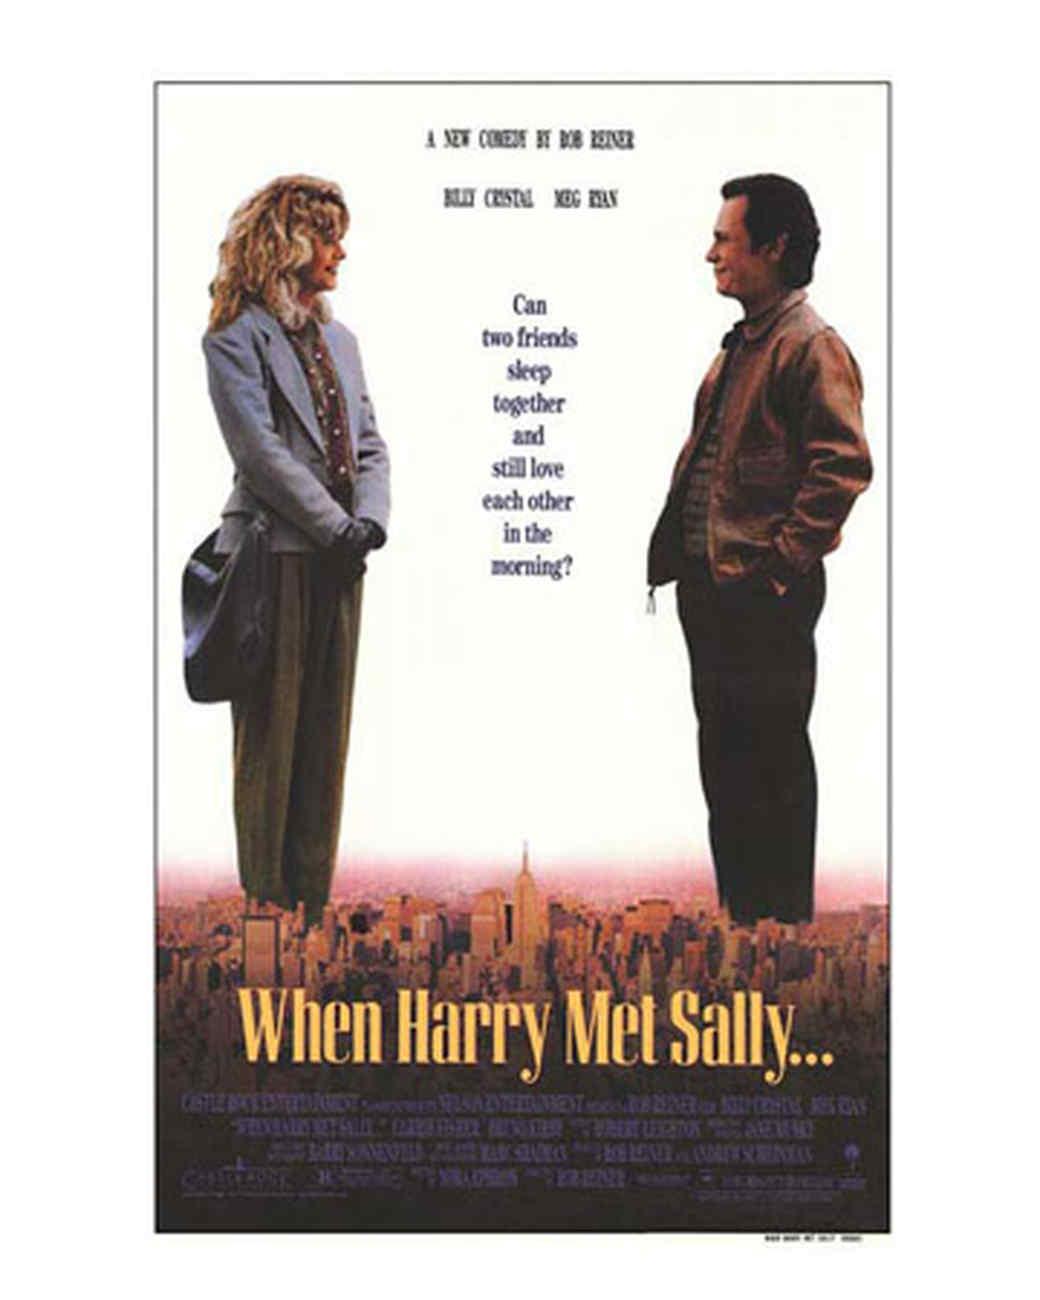 stock_movie_stills_when_harry_met_sally_poster.jpg